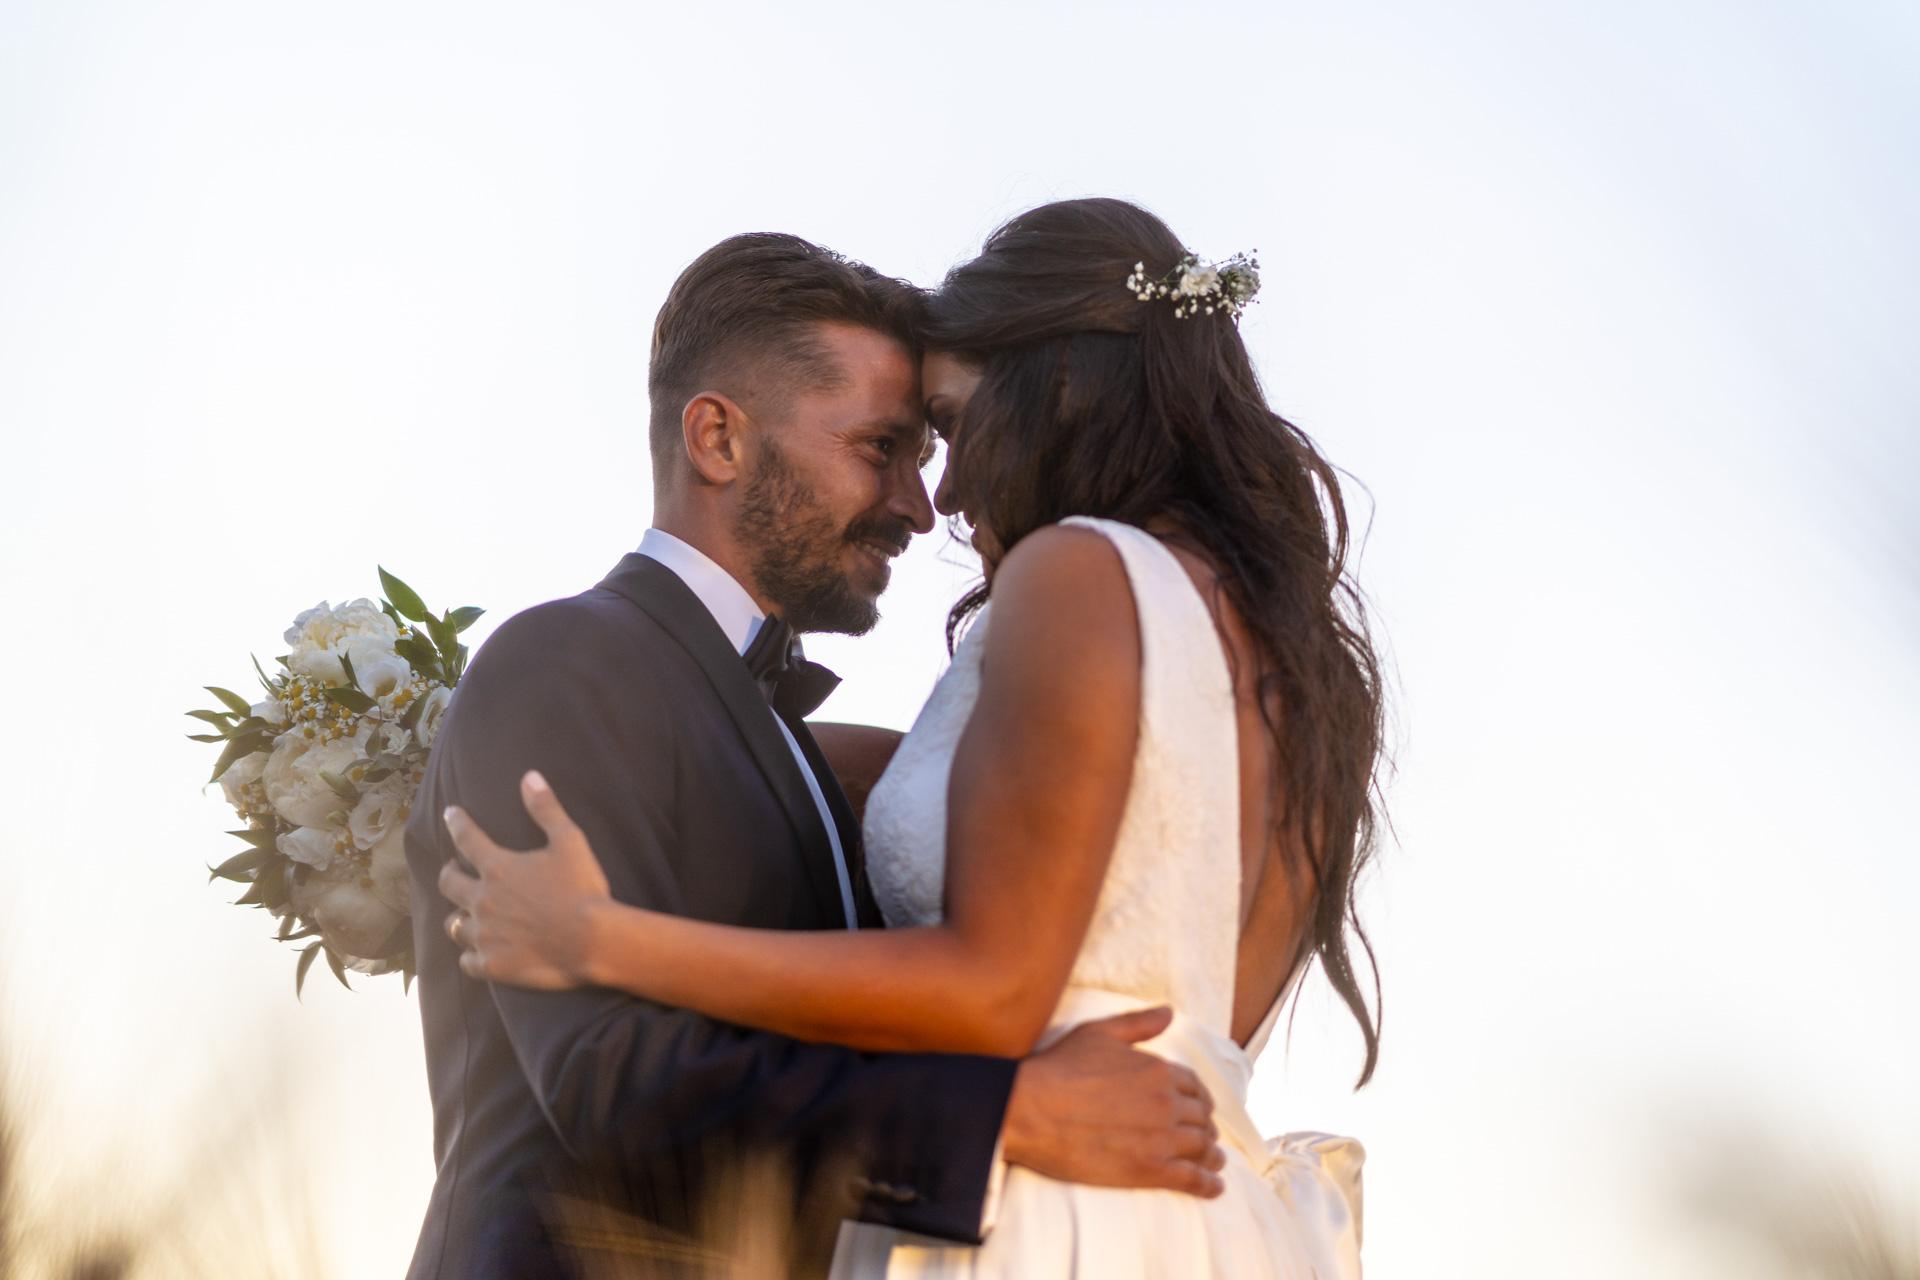 merafina photographer alfonso merafina stefania e nicola wedding